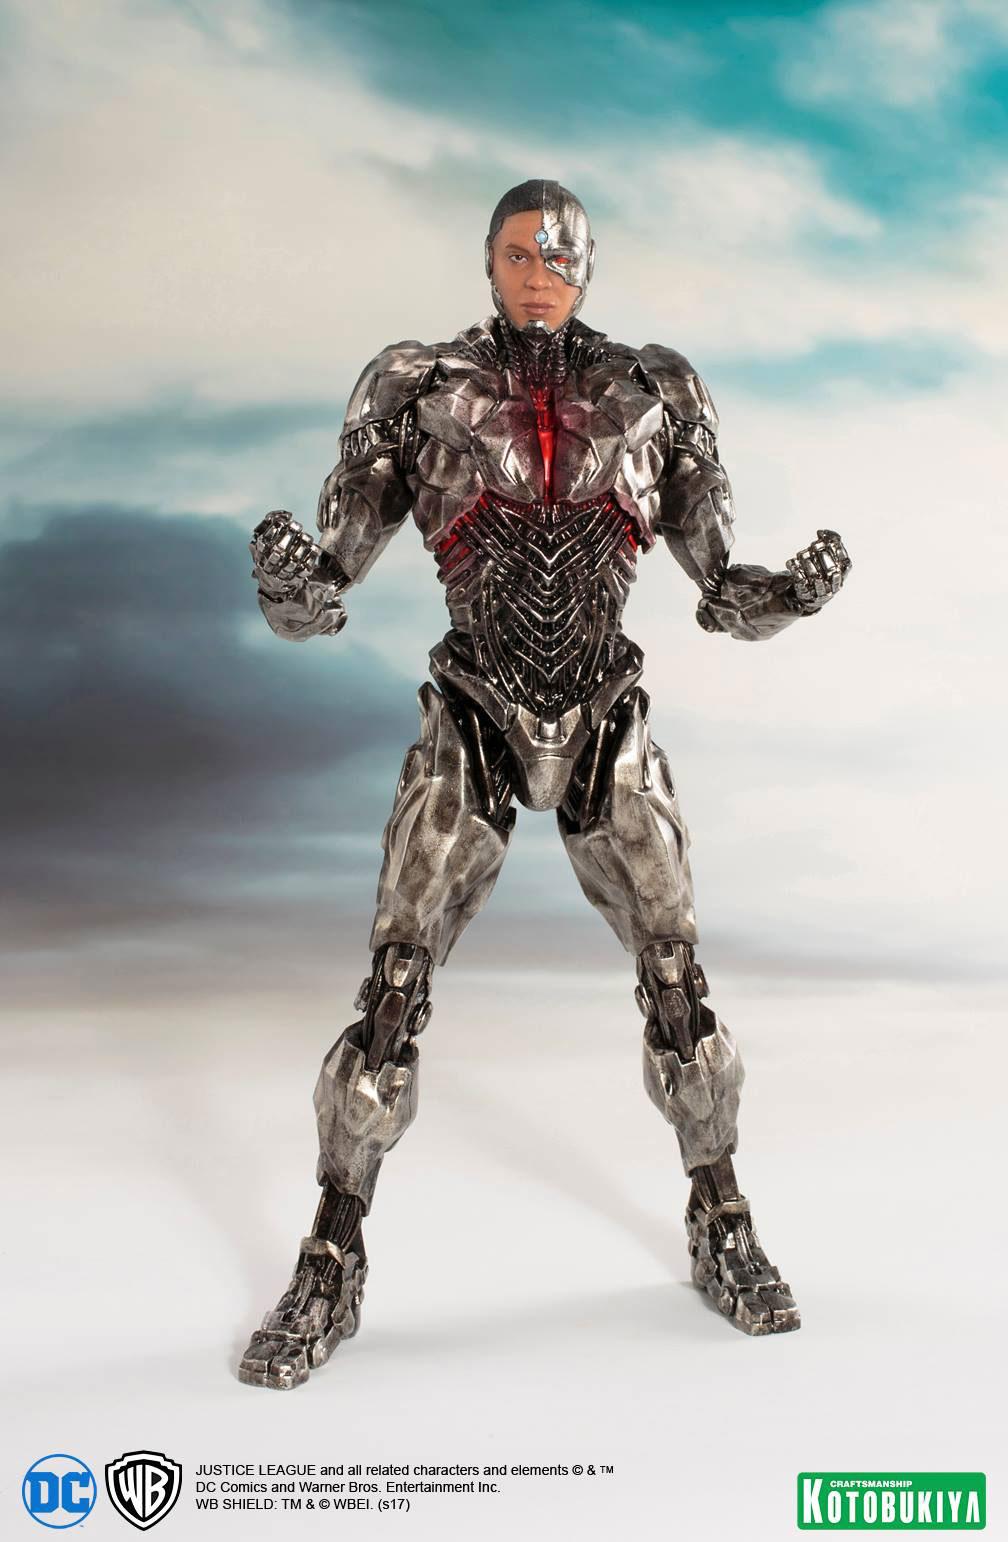 kotobukiya-justice-league-cyborg-statue